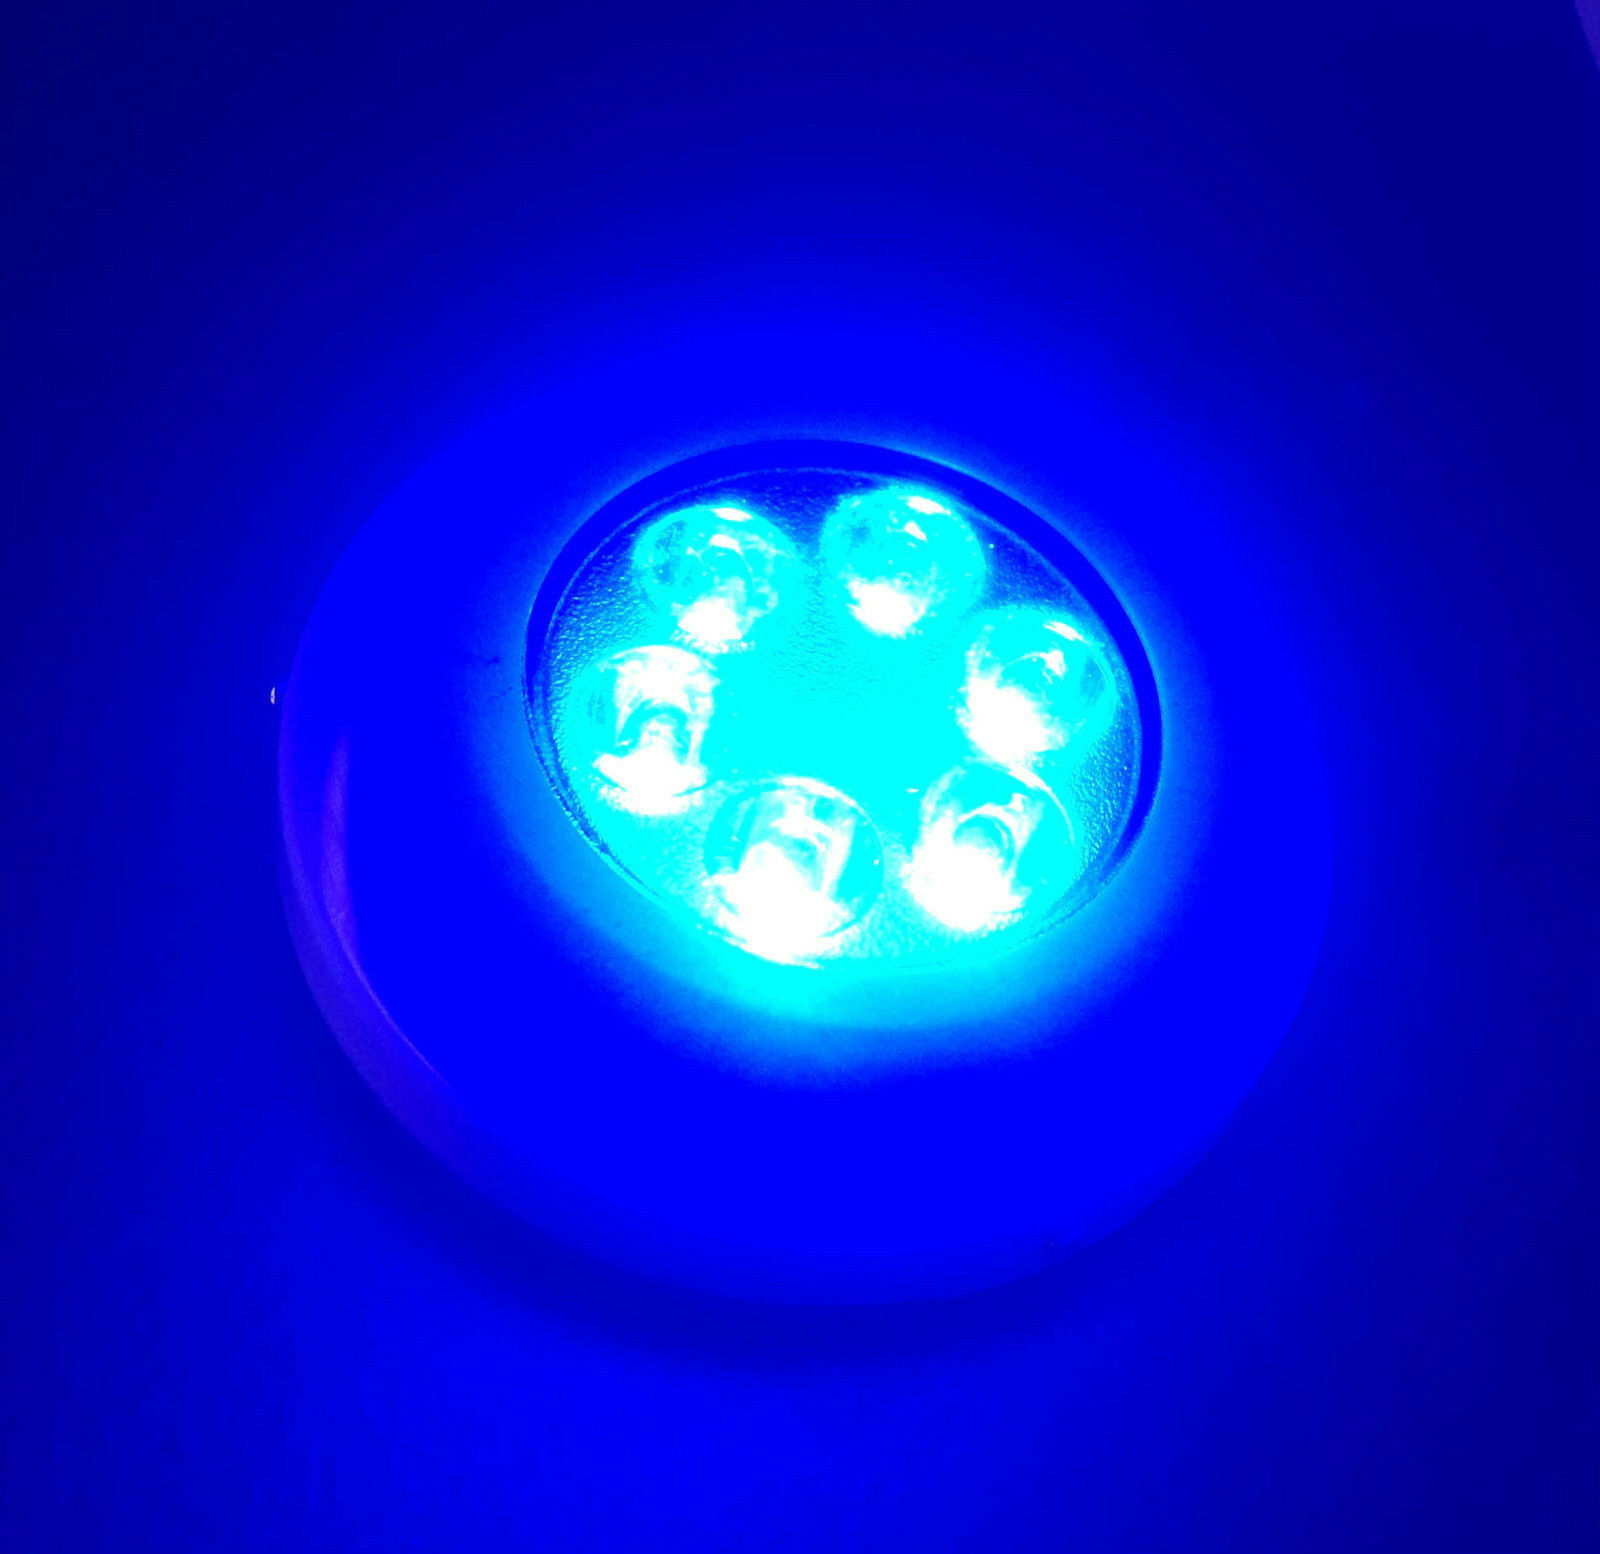 ULTRA BRIGHT BRIGHT BRIGHT COOL Weiß LED MARINE POLYMER UNDERWATER LIGHT SURFACE MOUNT f394f1